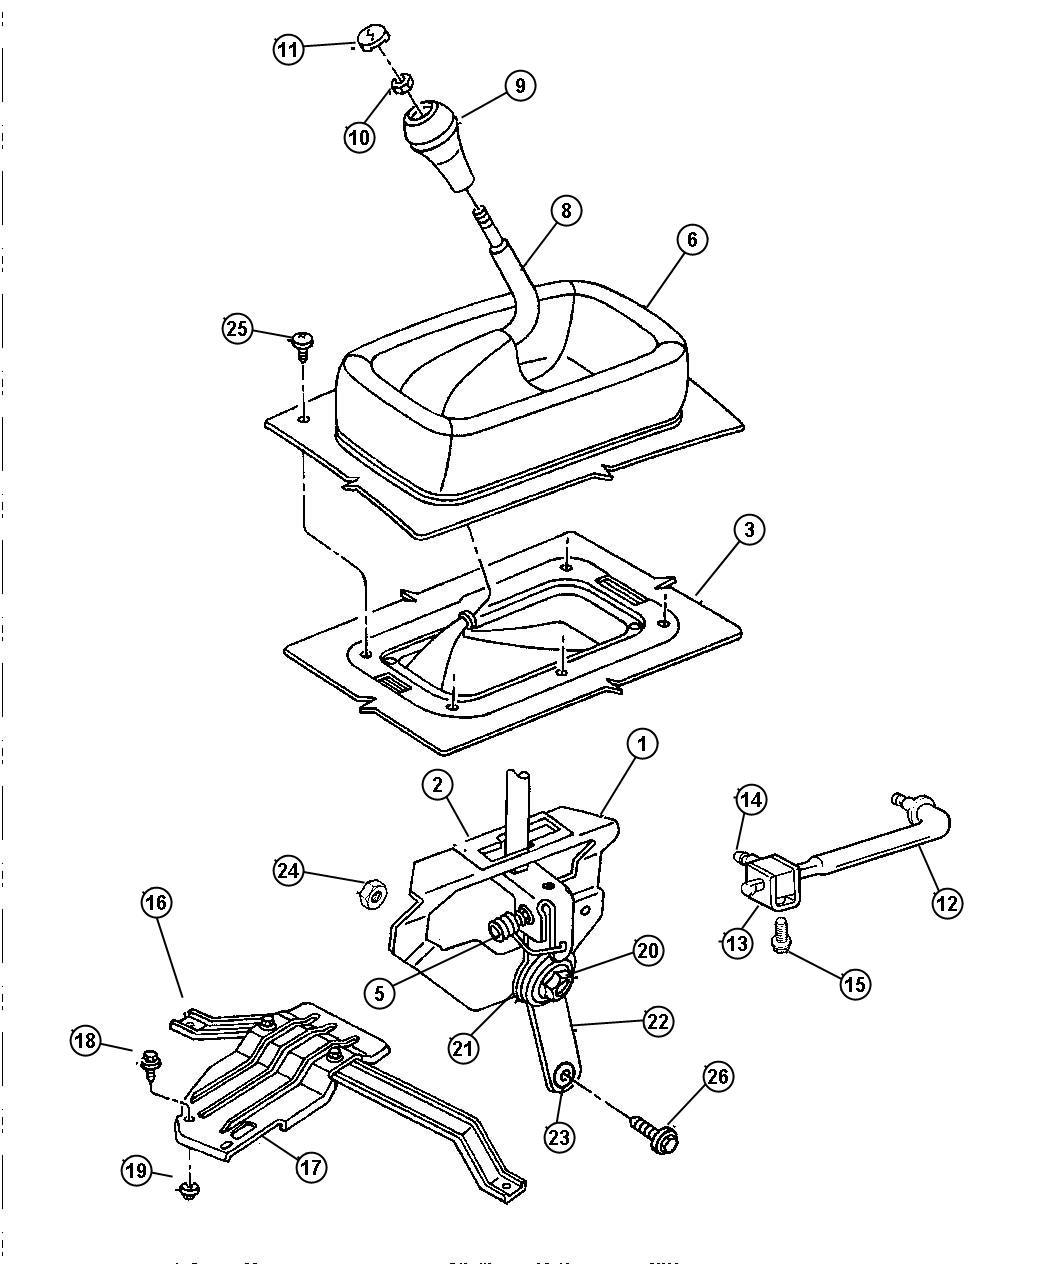 Dodge Ram 3500 Rod. Gear shift control. Transfer case